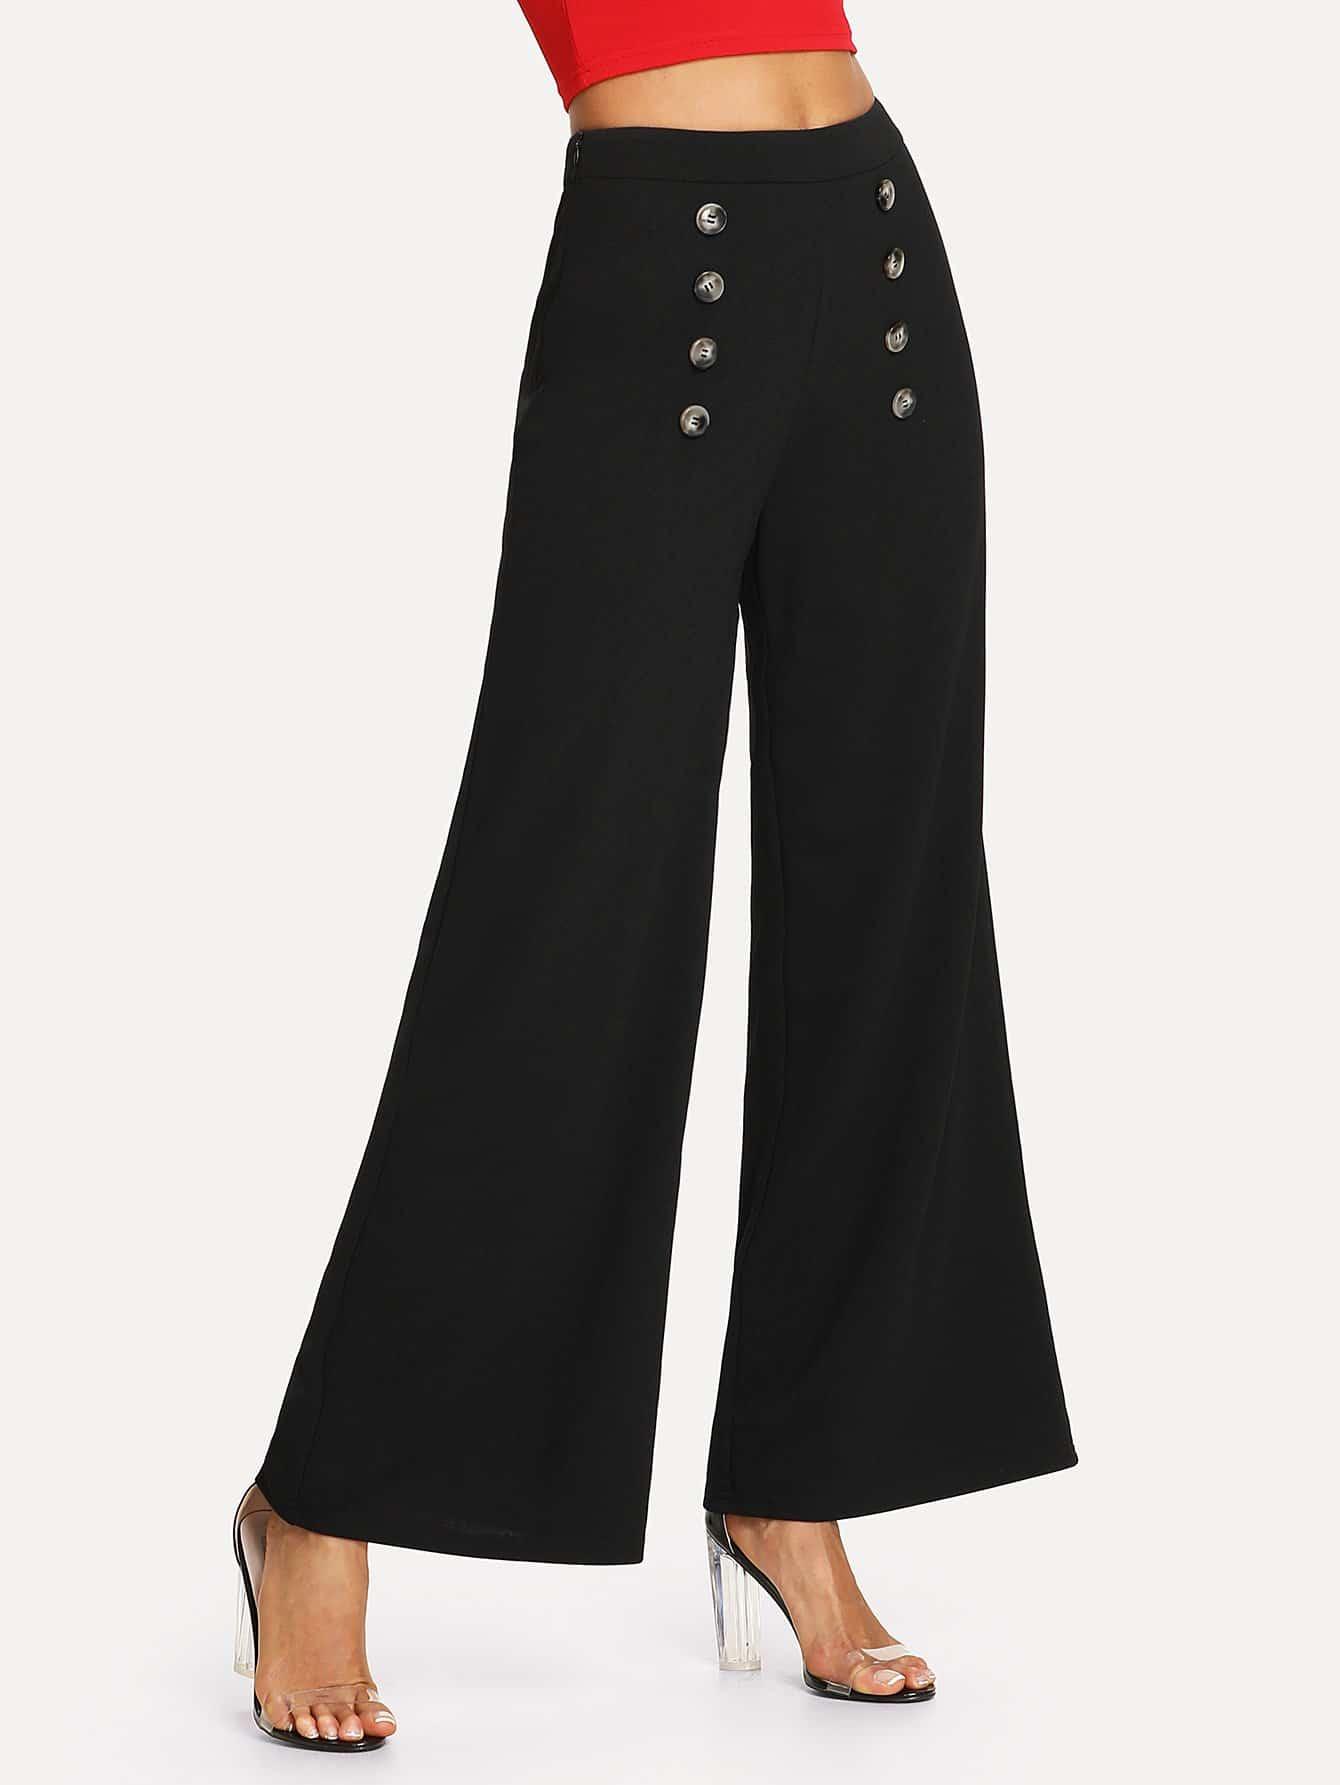 Button Embellished Wide Leg Pants button embellished fit